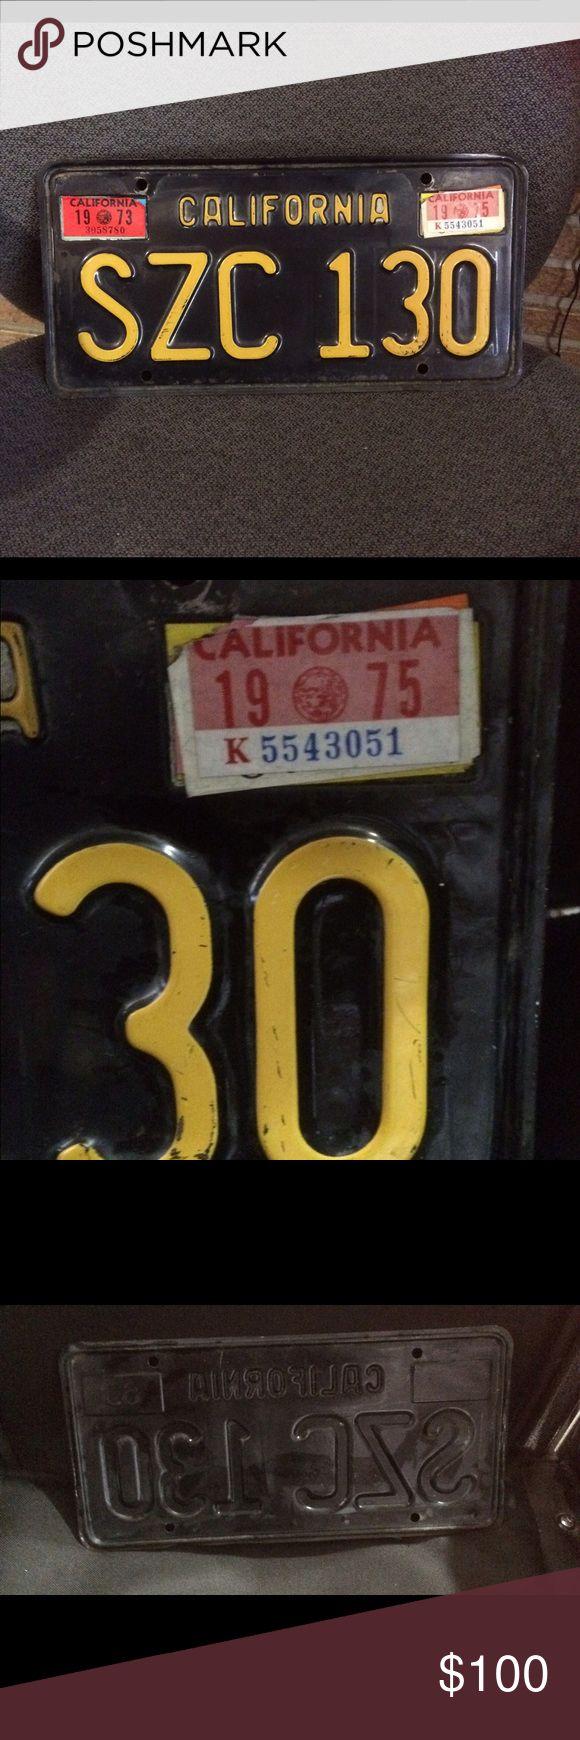 California license plate vintage black